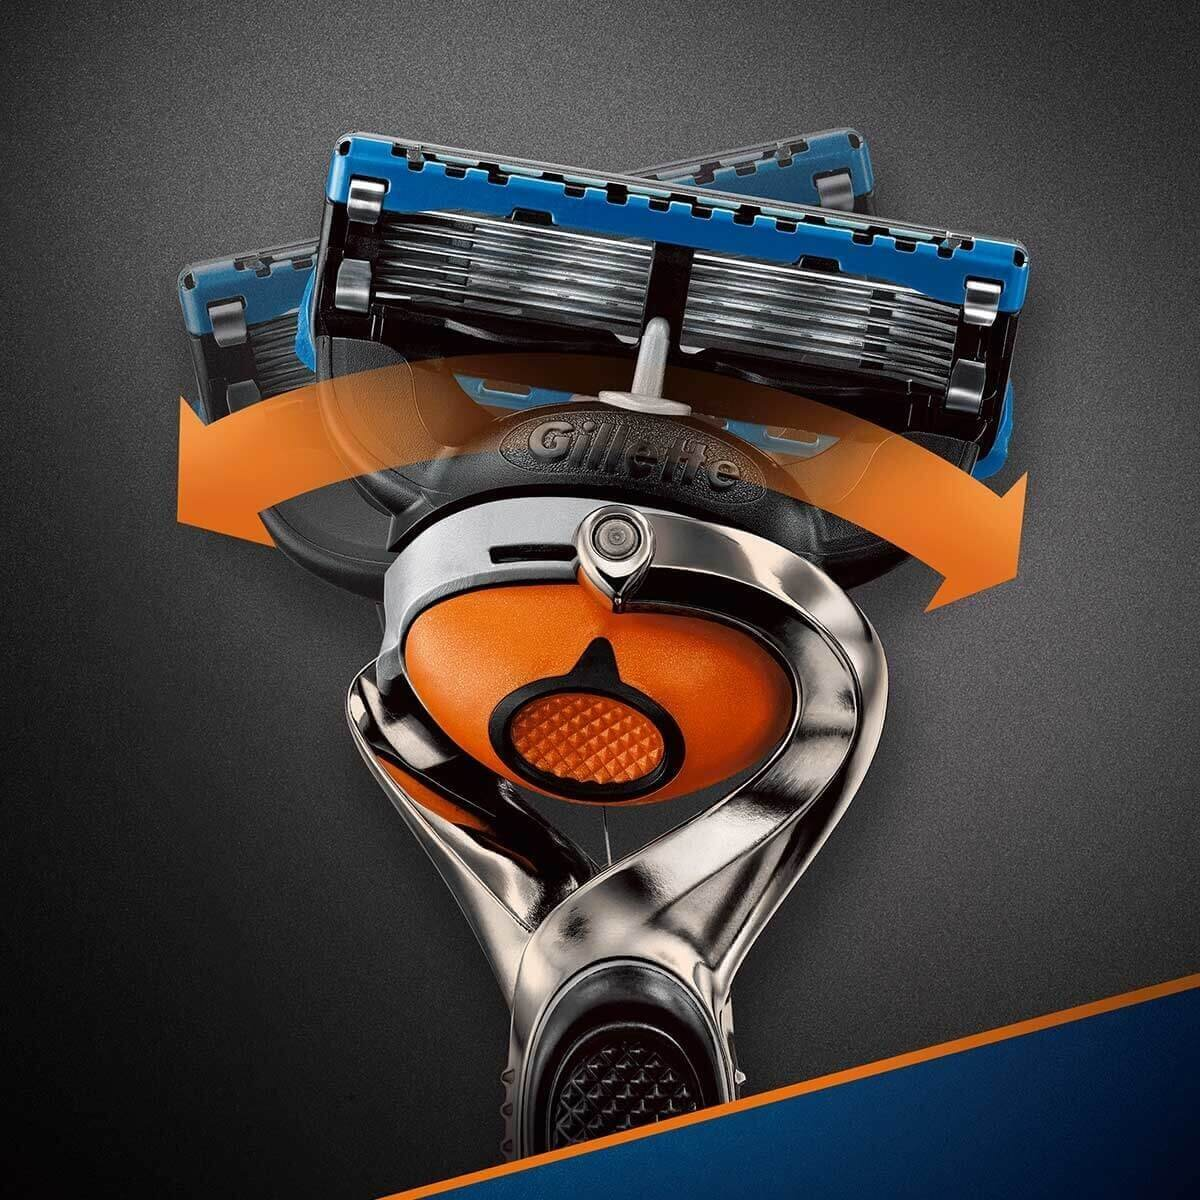 Fusion ProGlide FlexBall Tıraş Makinesi Yedekli